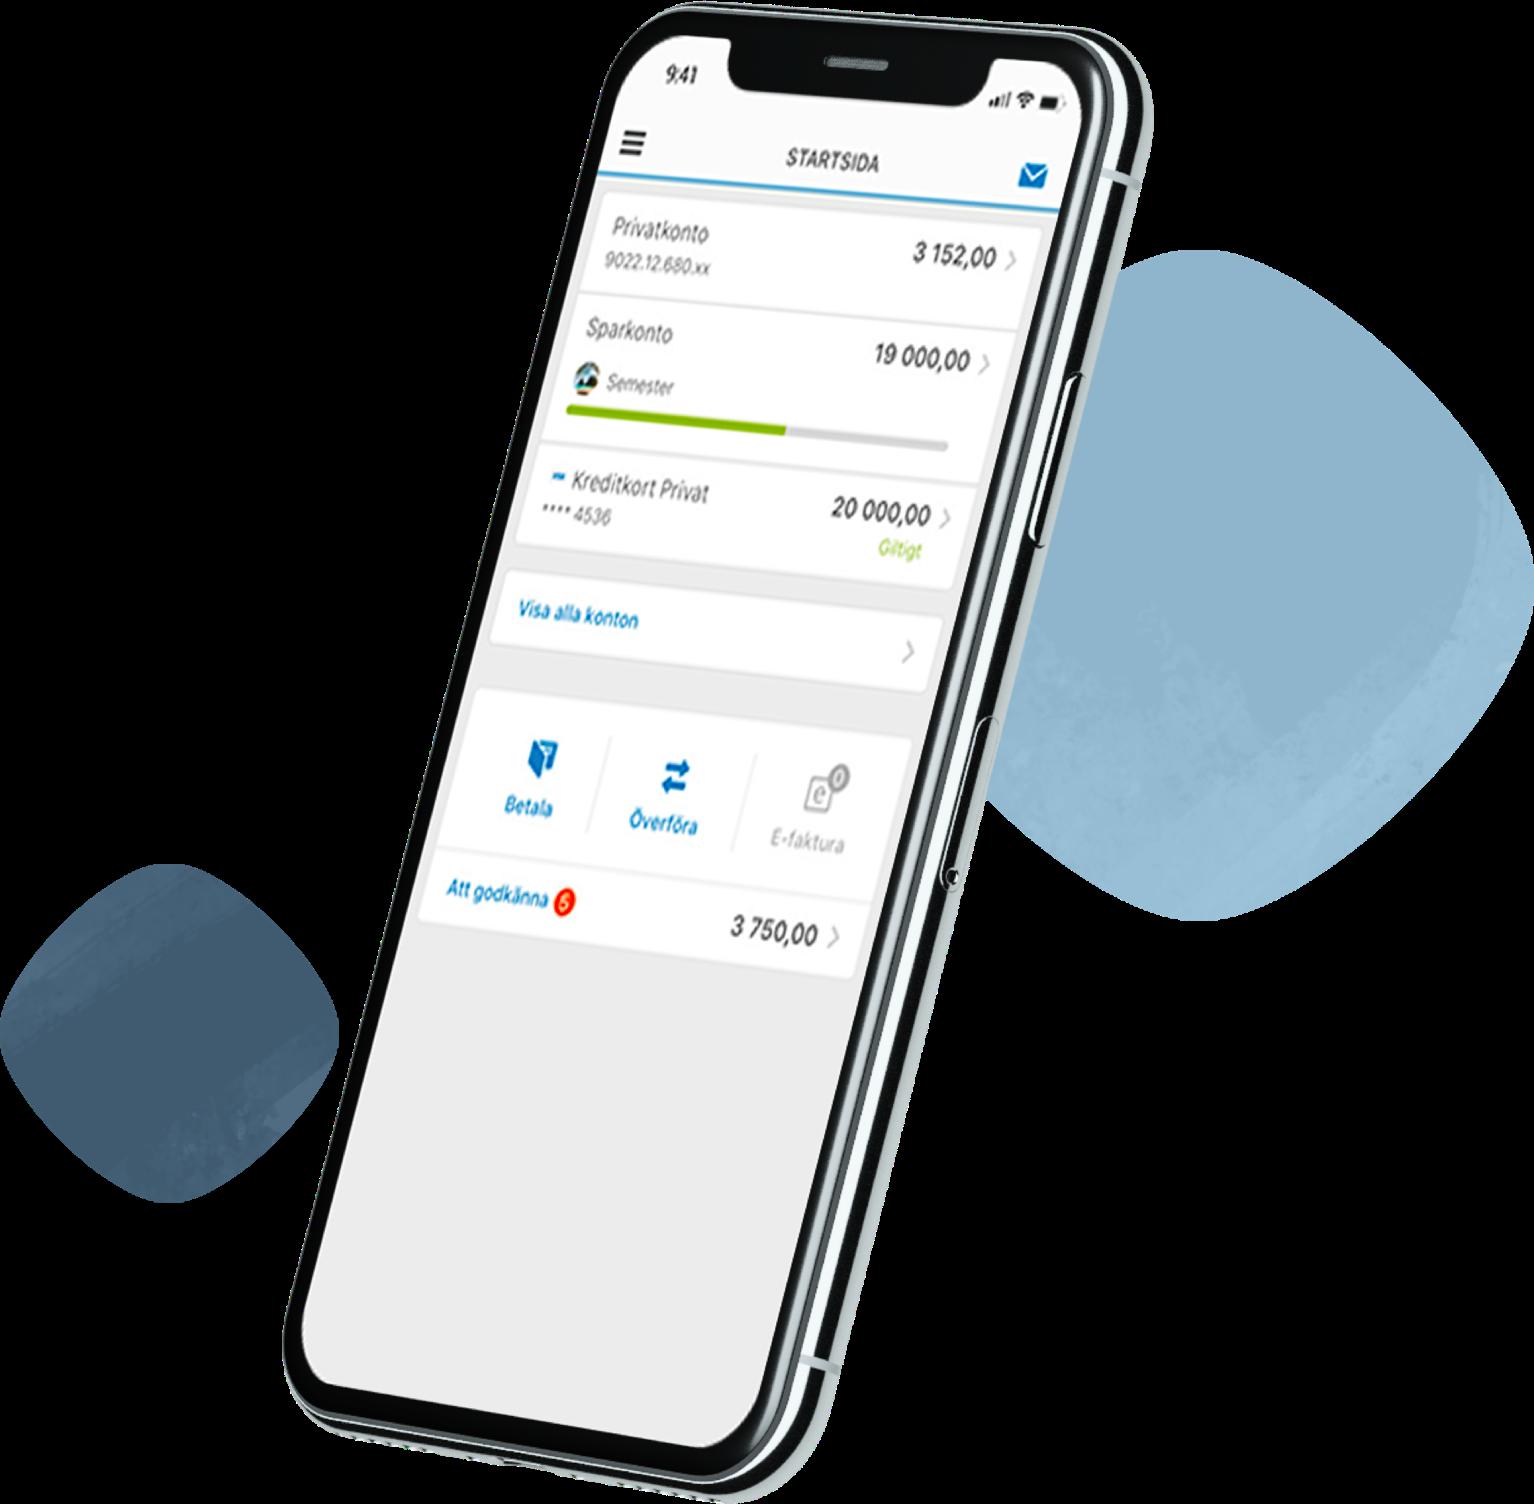 A phone with Länsförsäkringar Bank app displayed on it.